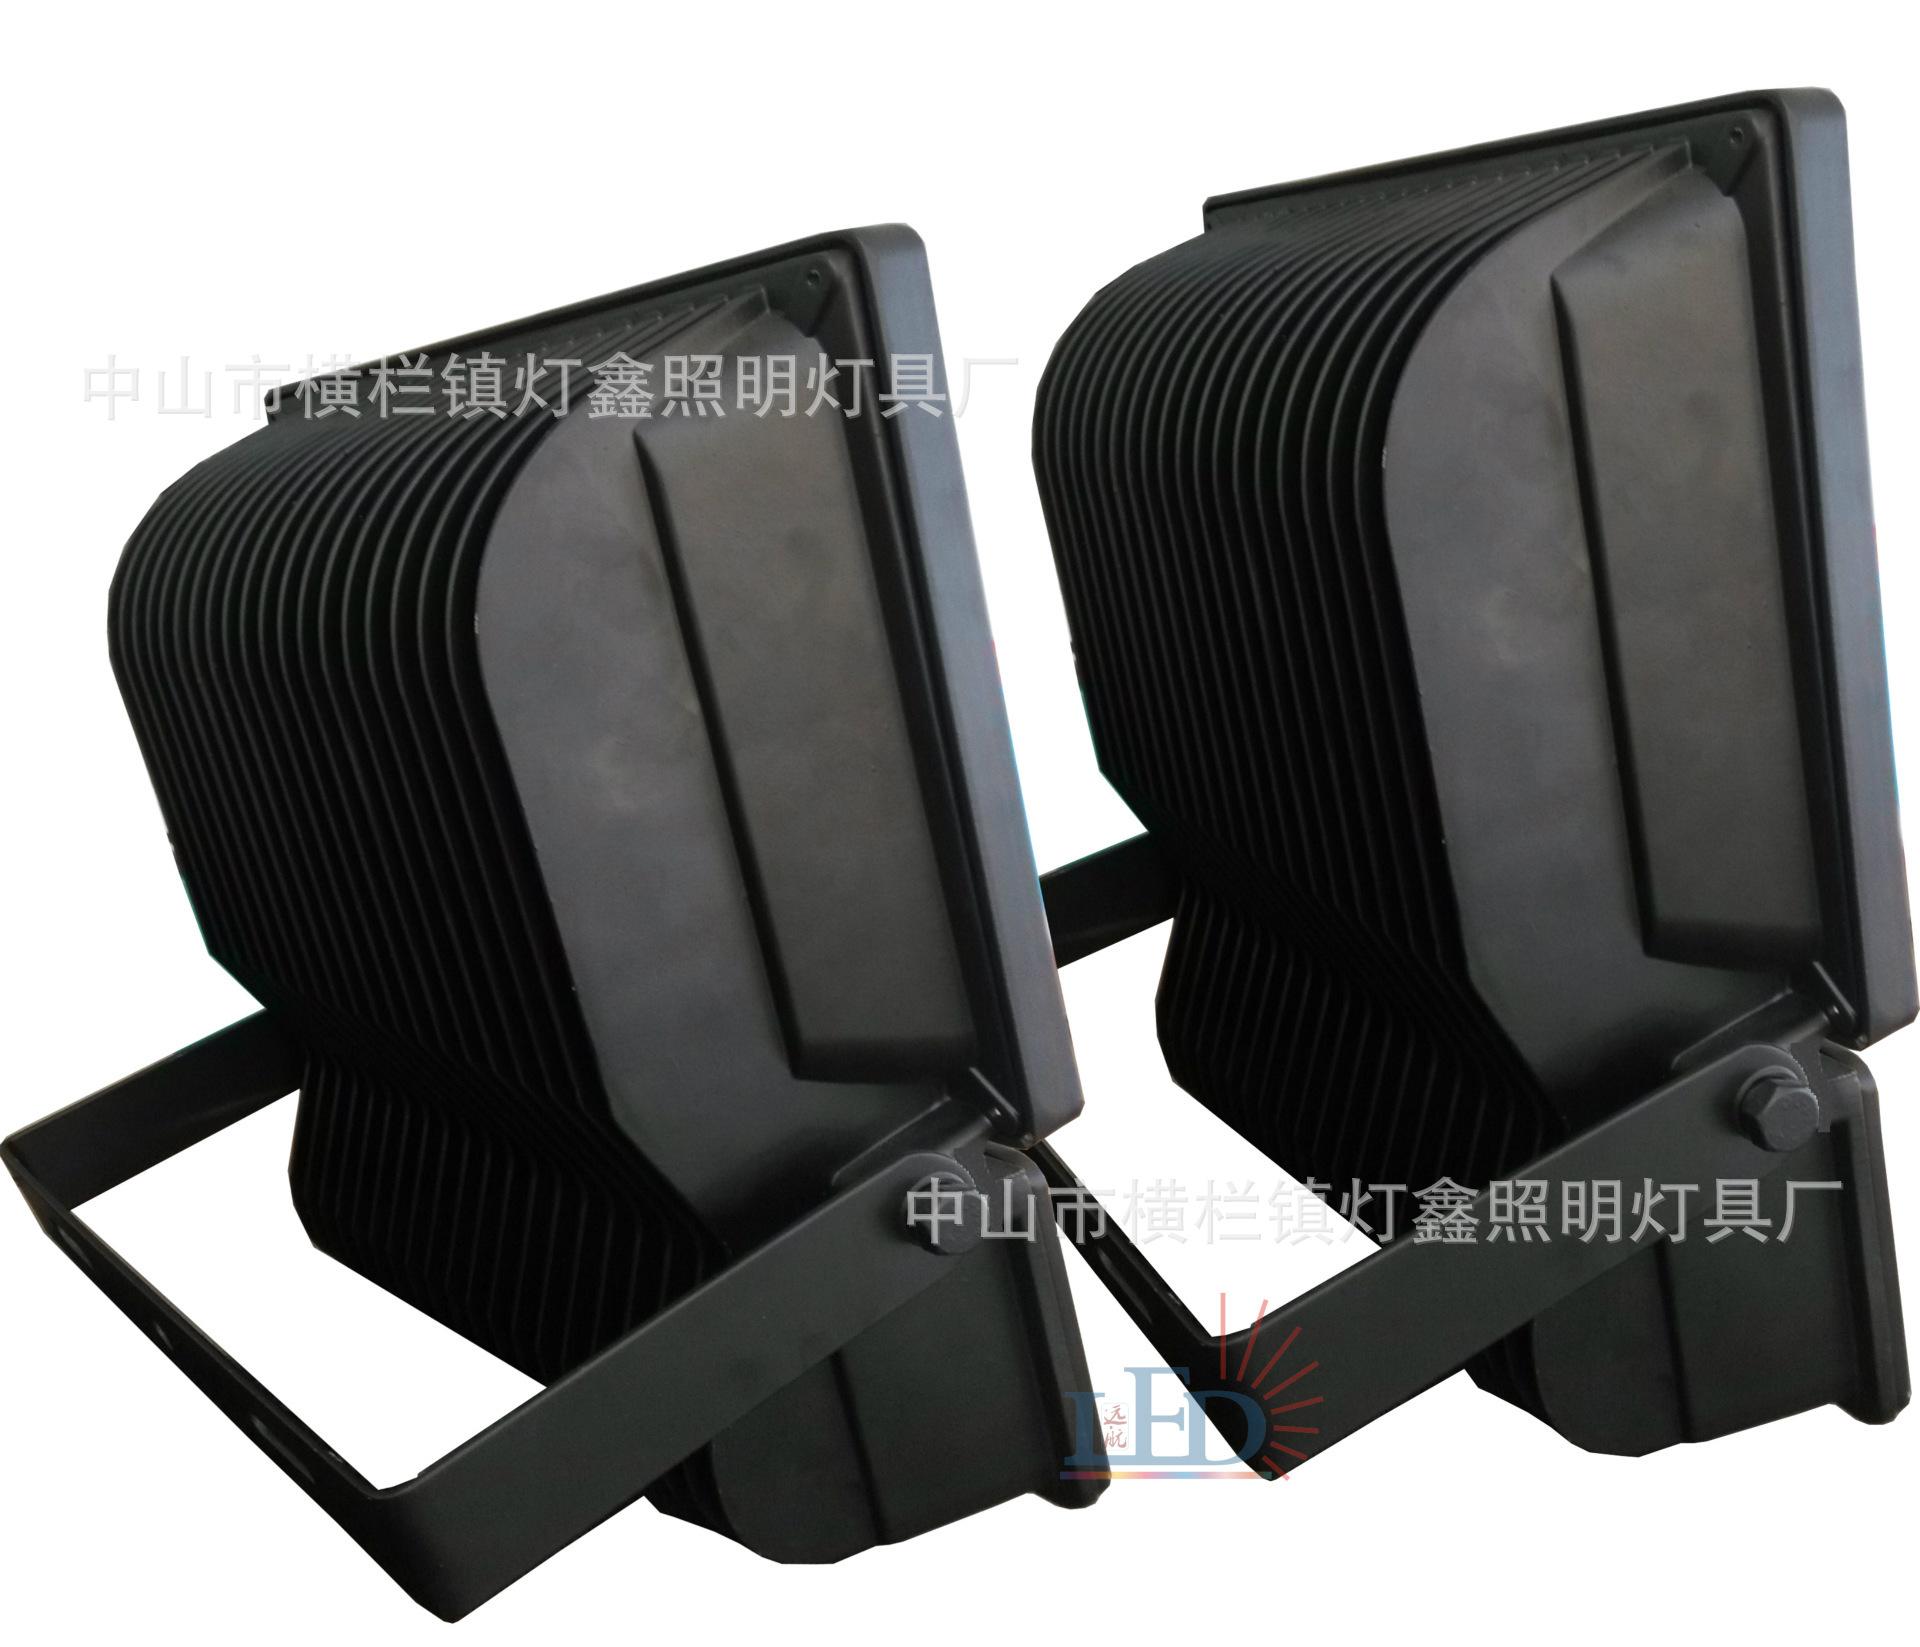 Đèn LED thấu kính  100W integrated 100W with double shell; lens floodlight shell; high power lamp s